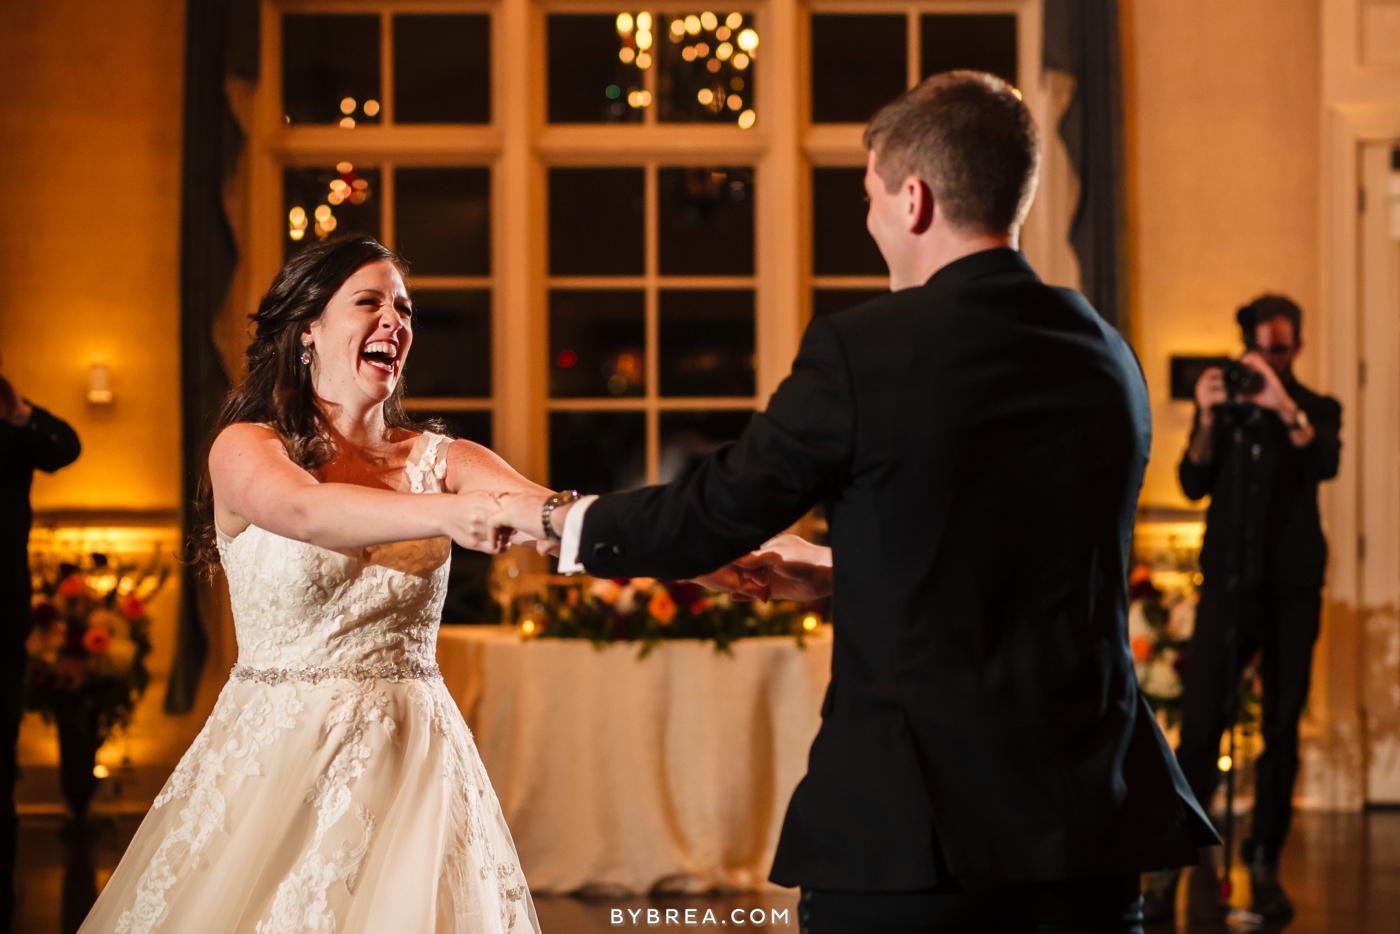 Baltimore wedding bride laughing during first dance